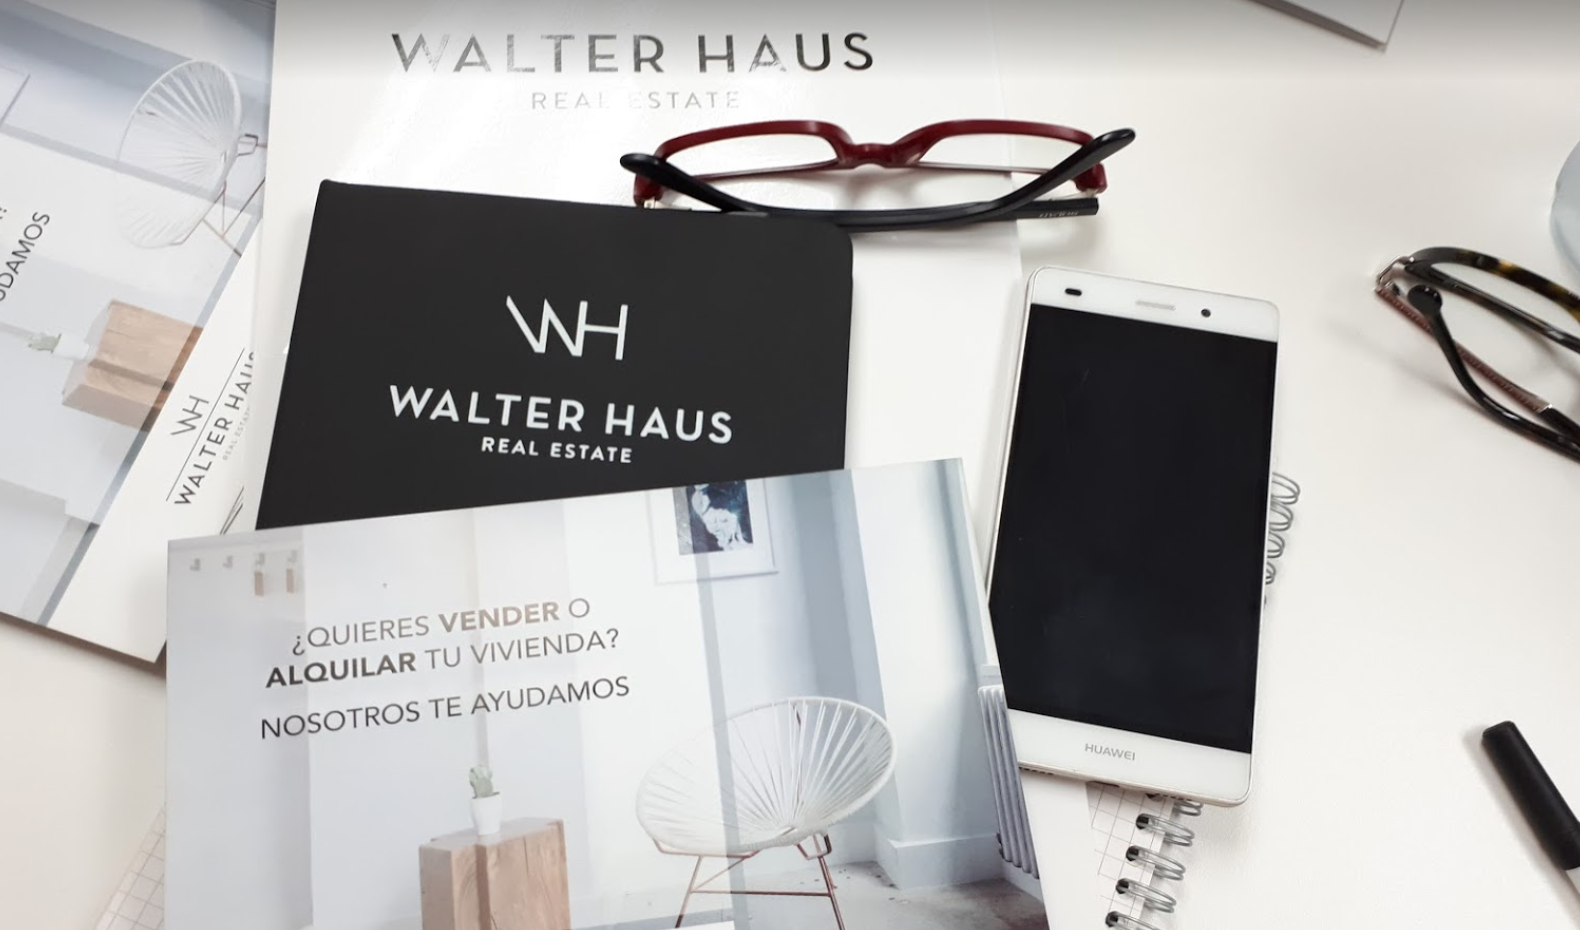 Walter Haus